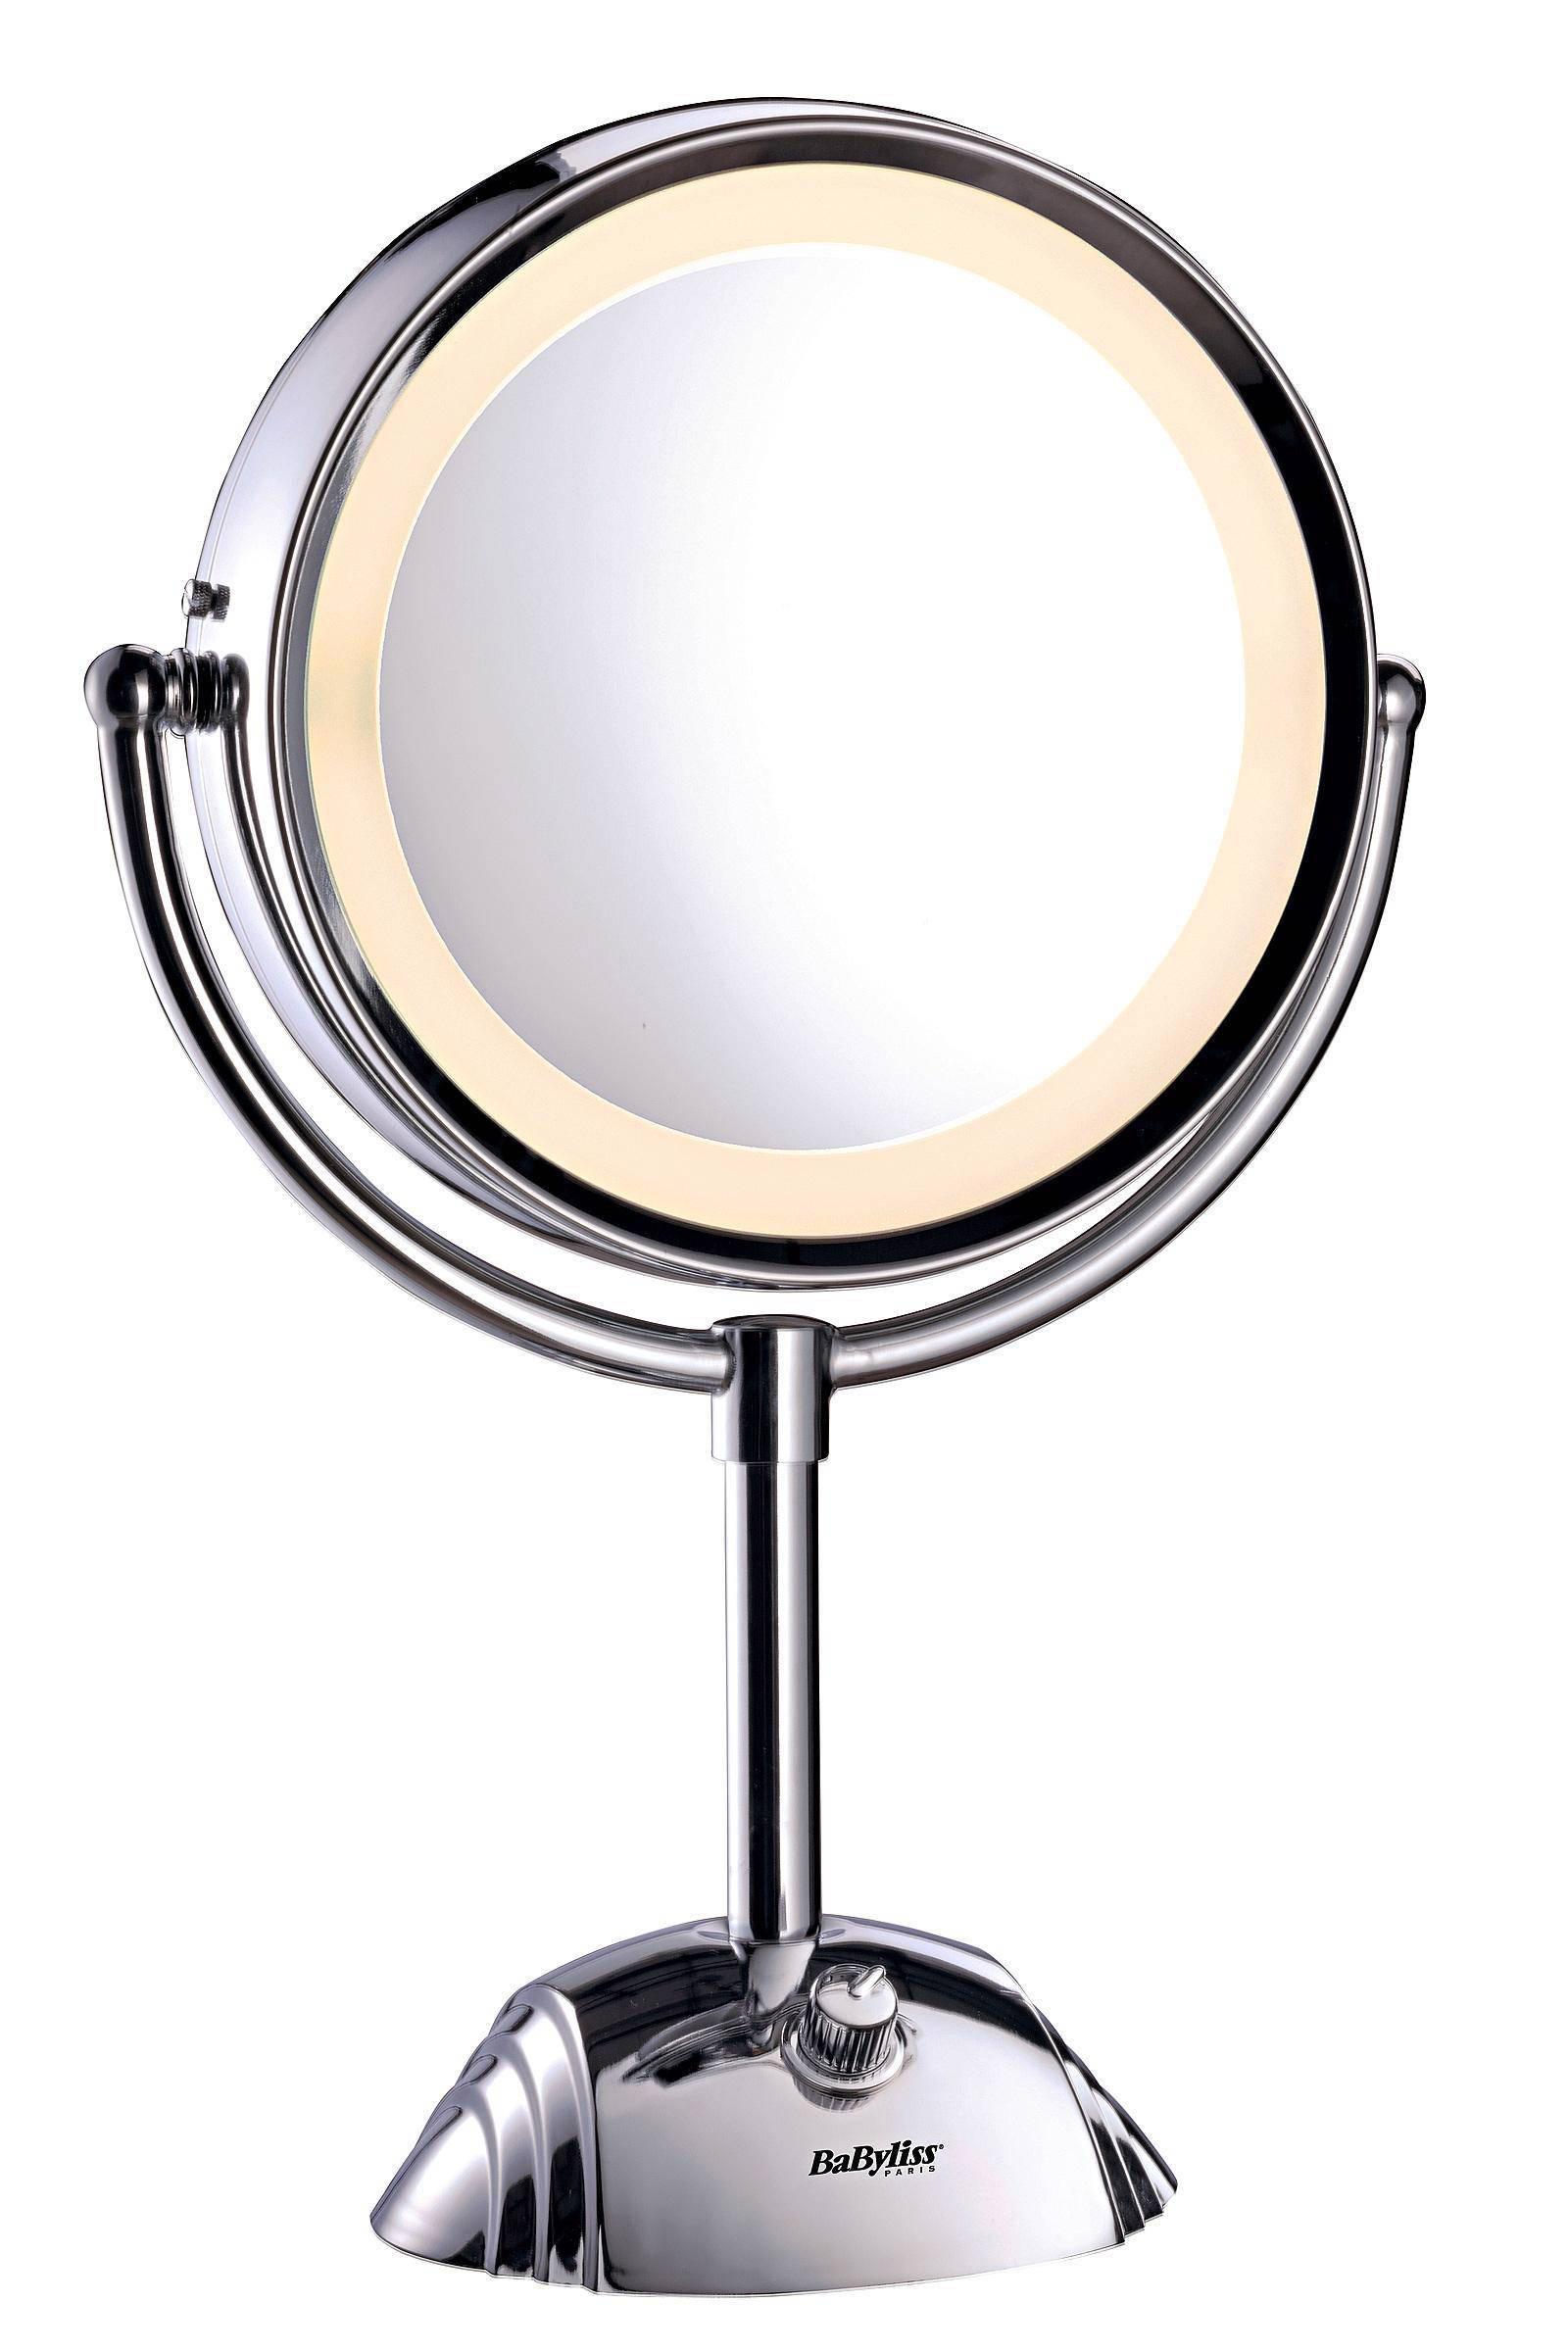 BaByliss Make-up spiegel met verlichting | wehkamp